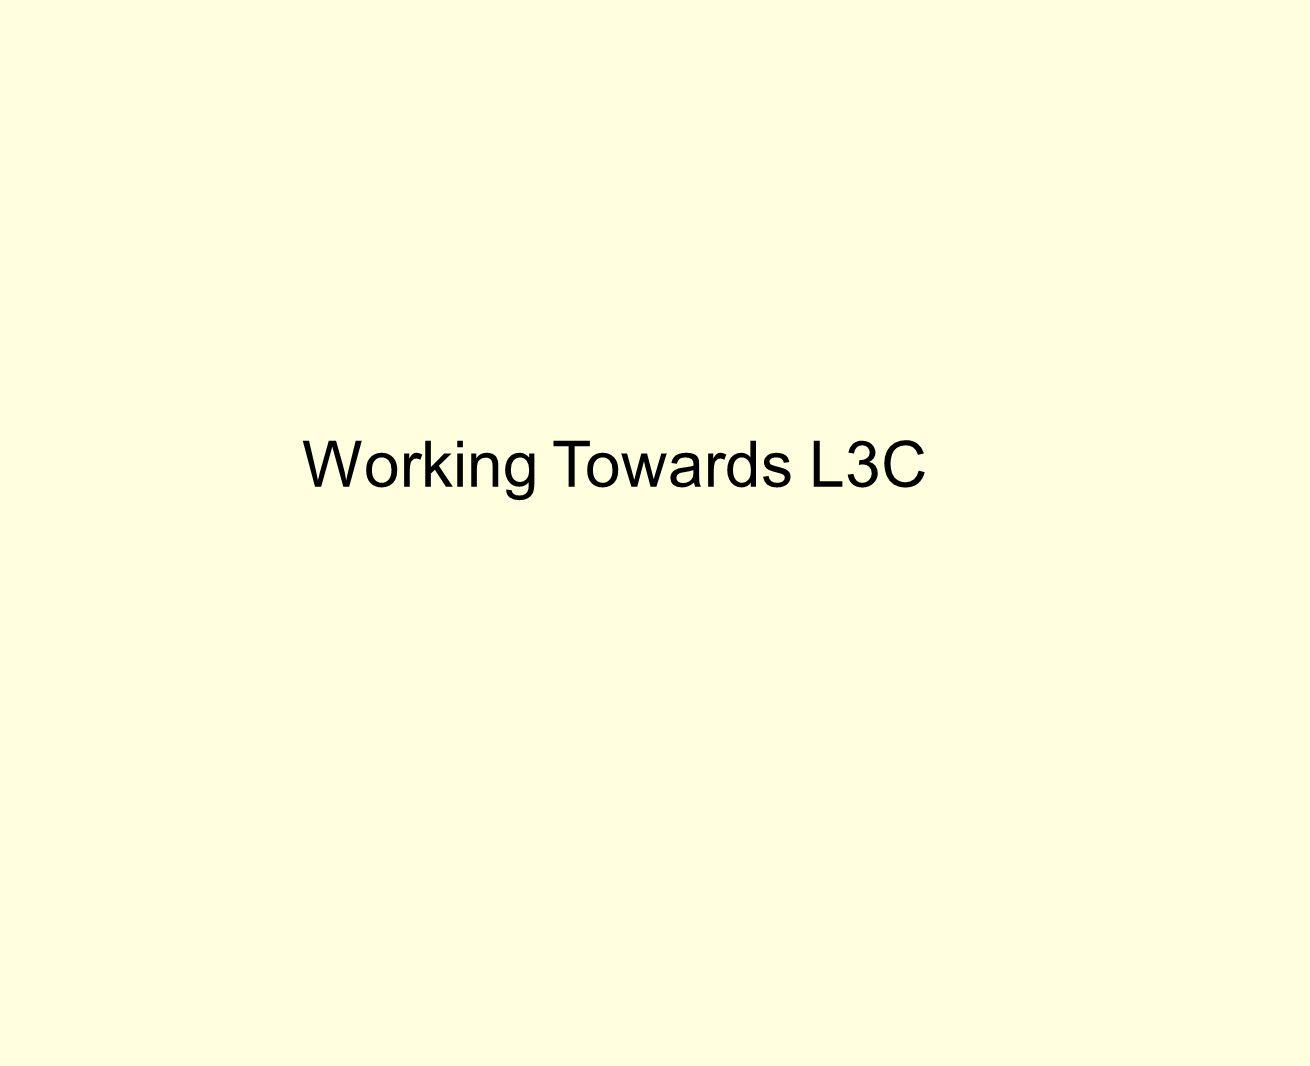 Working Towards L3C